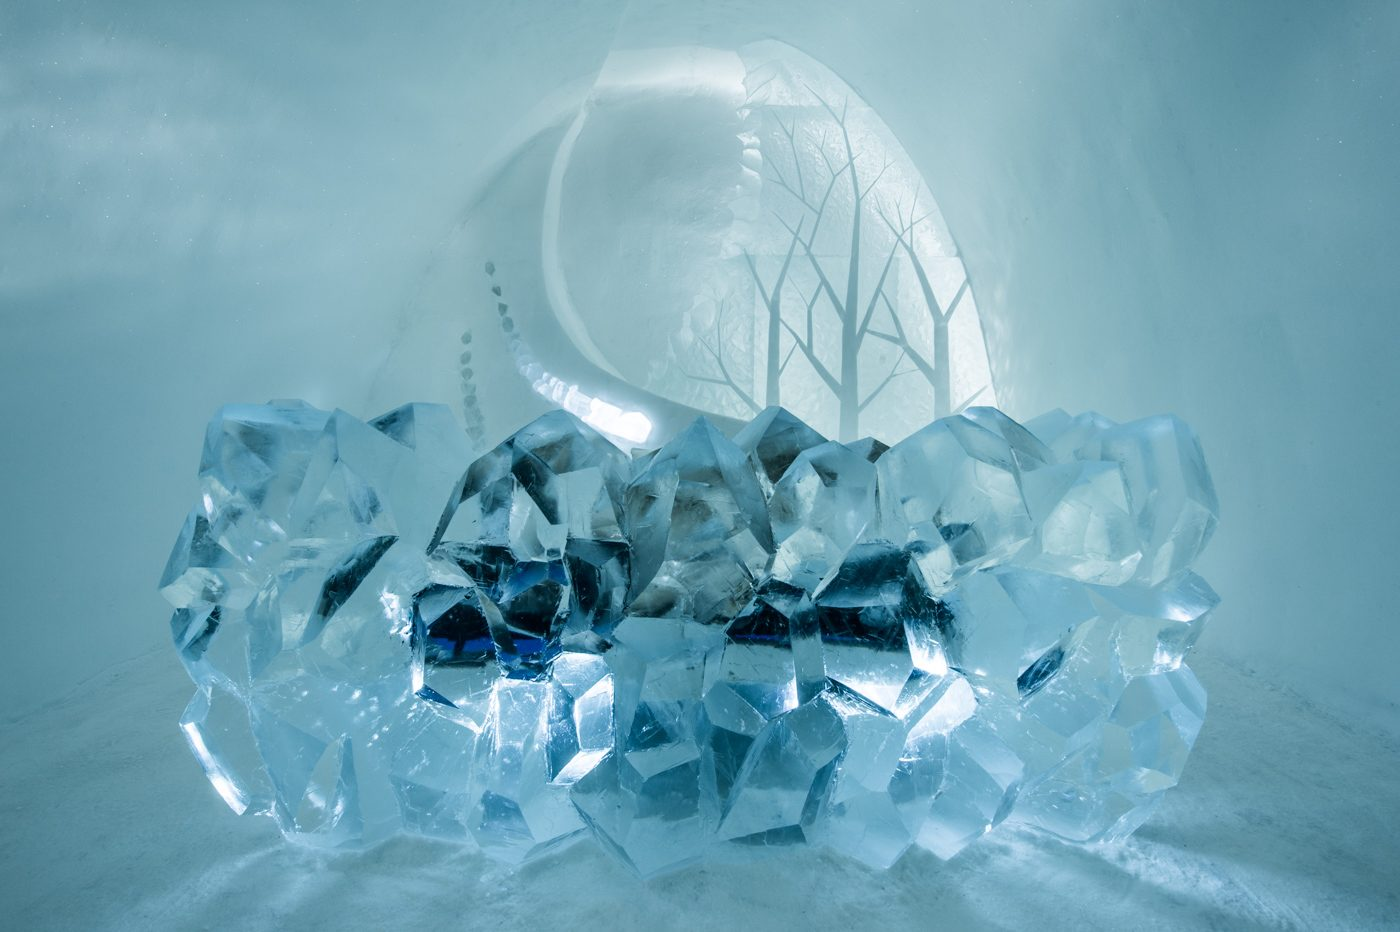 art-suite-radiance-icehotel-28-1400x932.jpg